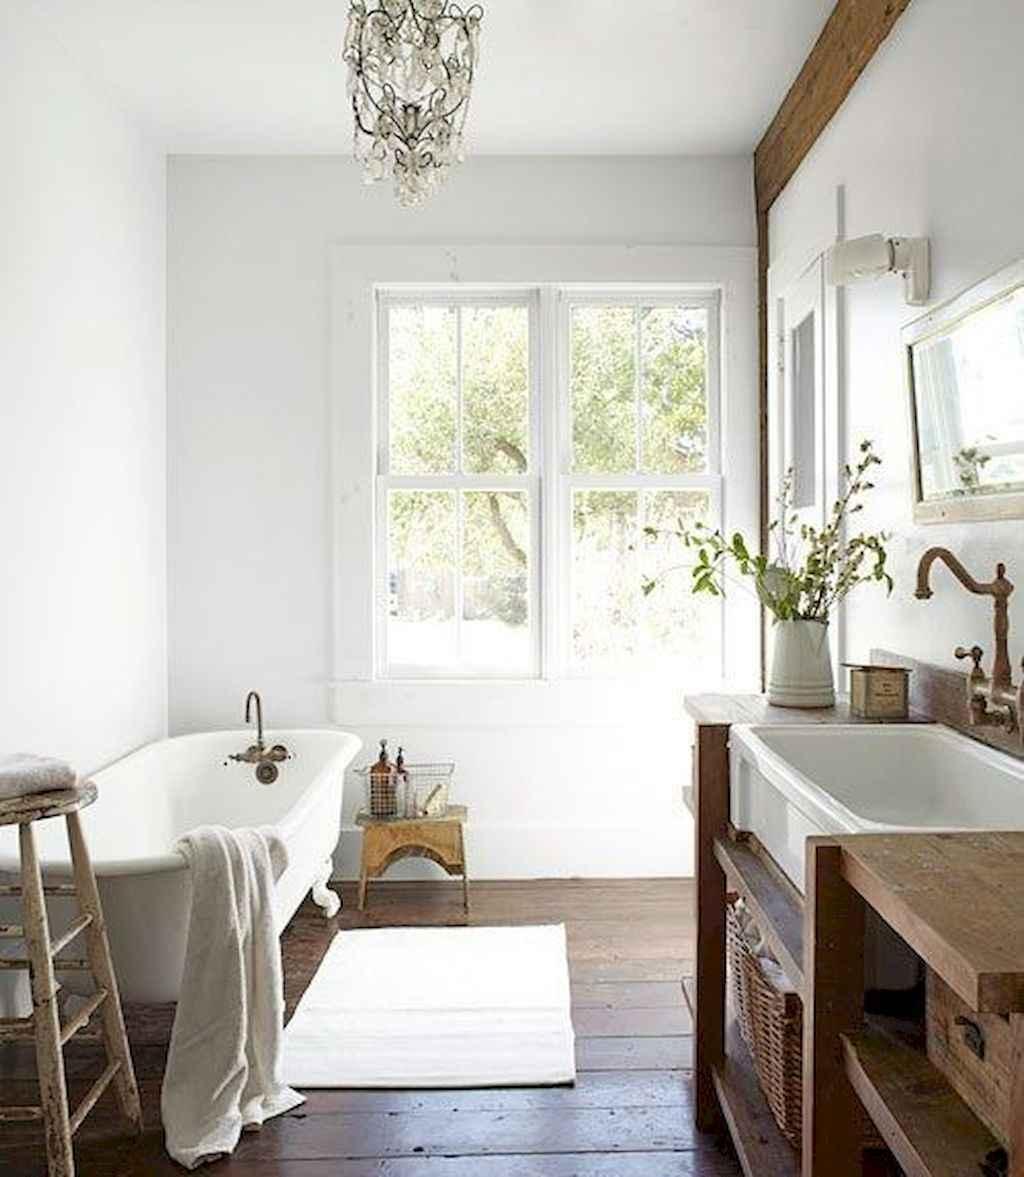 150 stunning farmhouse bathroom tile floor decor ideas and remodel to inspire your bathroom (26)